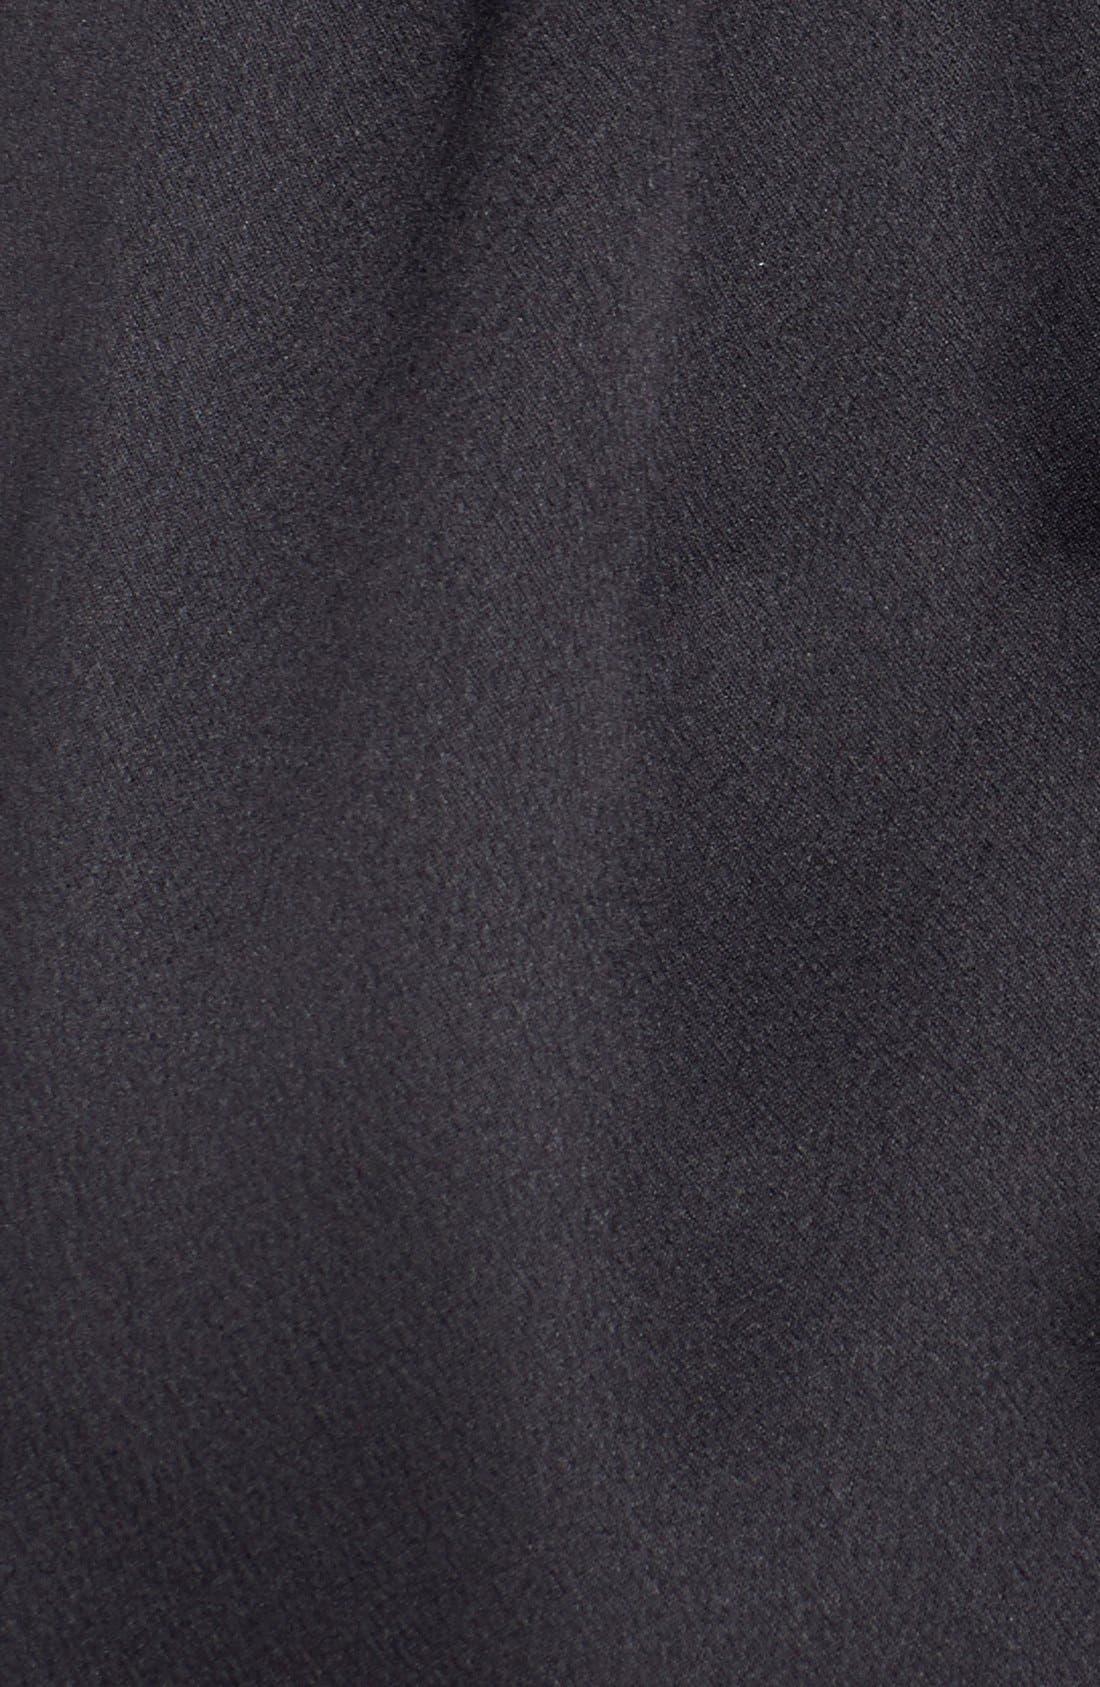 Showstopper Robe,                             Alternate thumbnail 9, color,                             BLACK